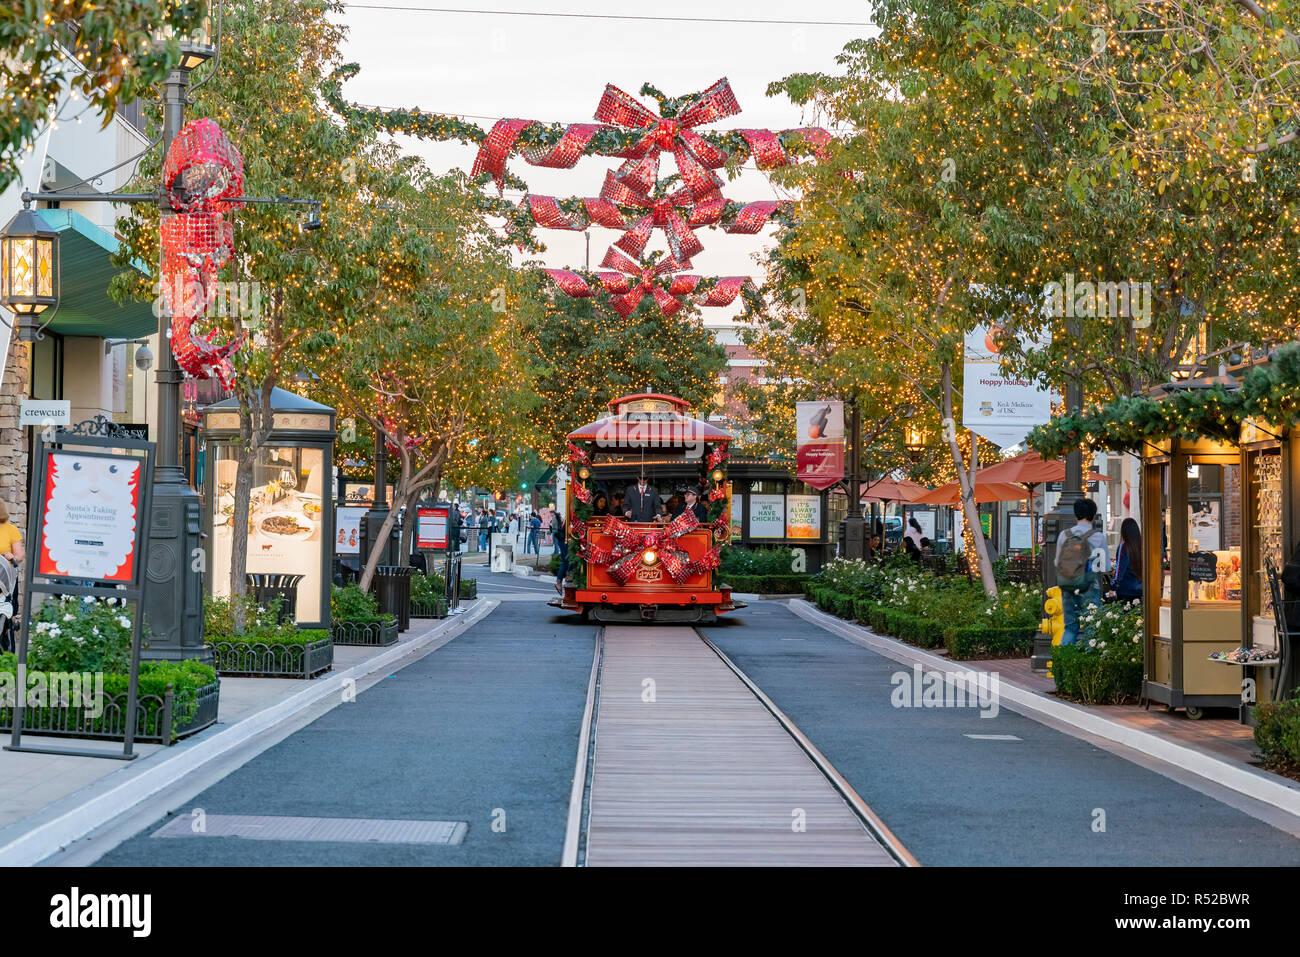 Americana At Brand >> Los Angeles Nov 26 The Beautiful Christmas Tram In The Americana